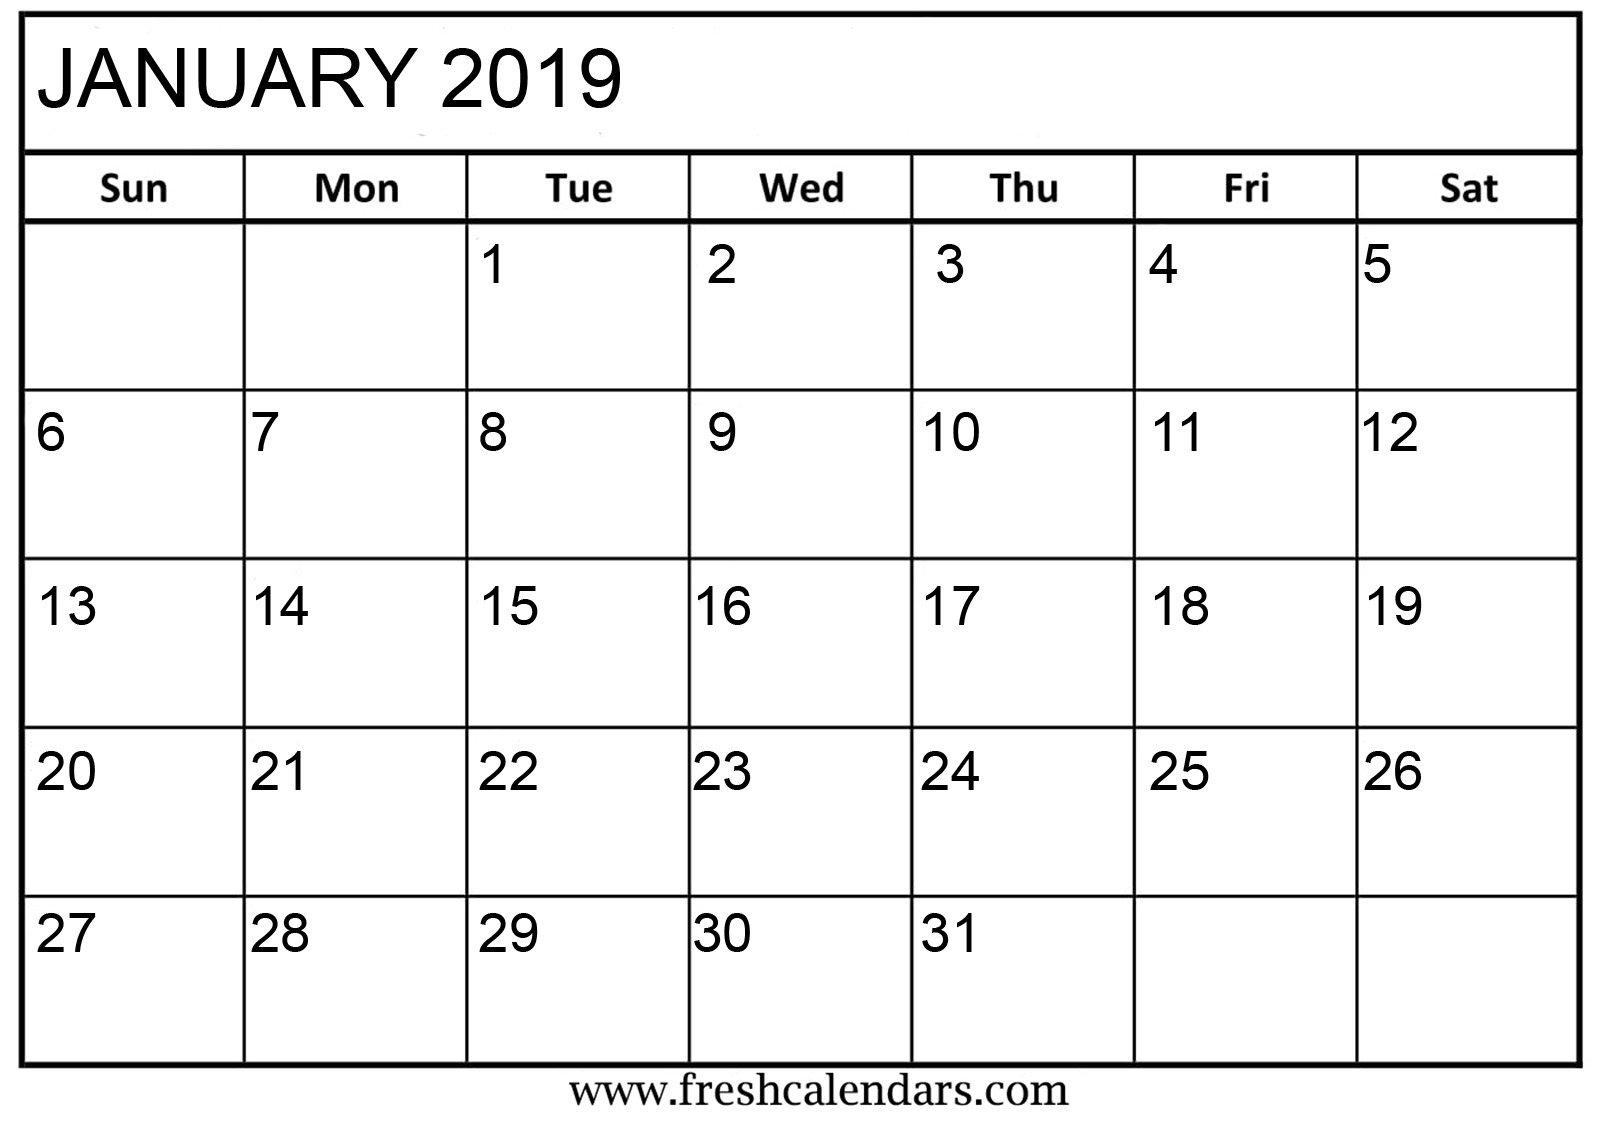 January 2019 Printable Calendars - Fresh Calendars Calendar 2019 Empty